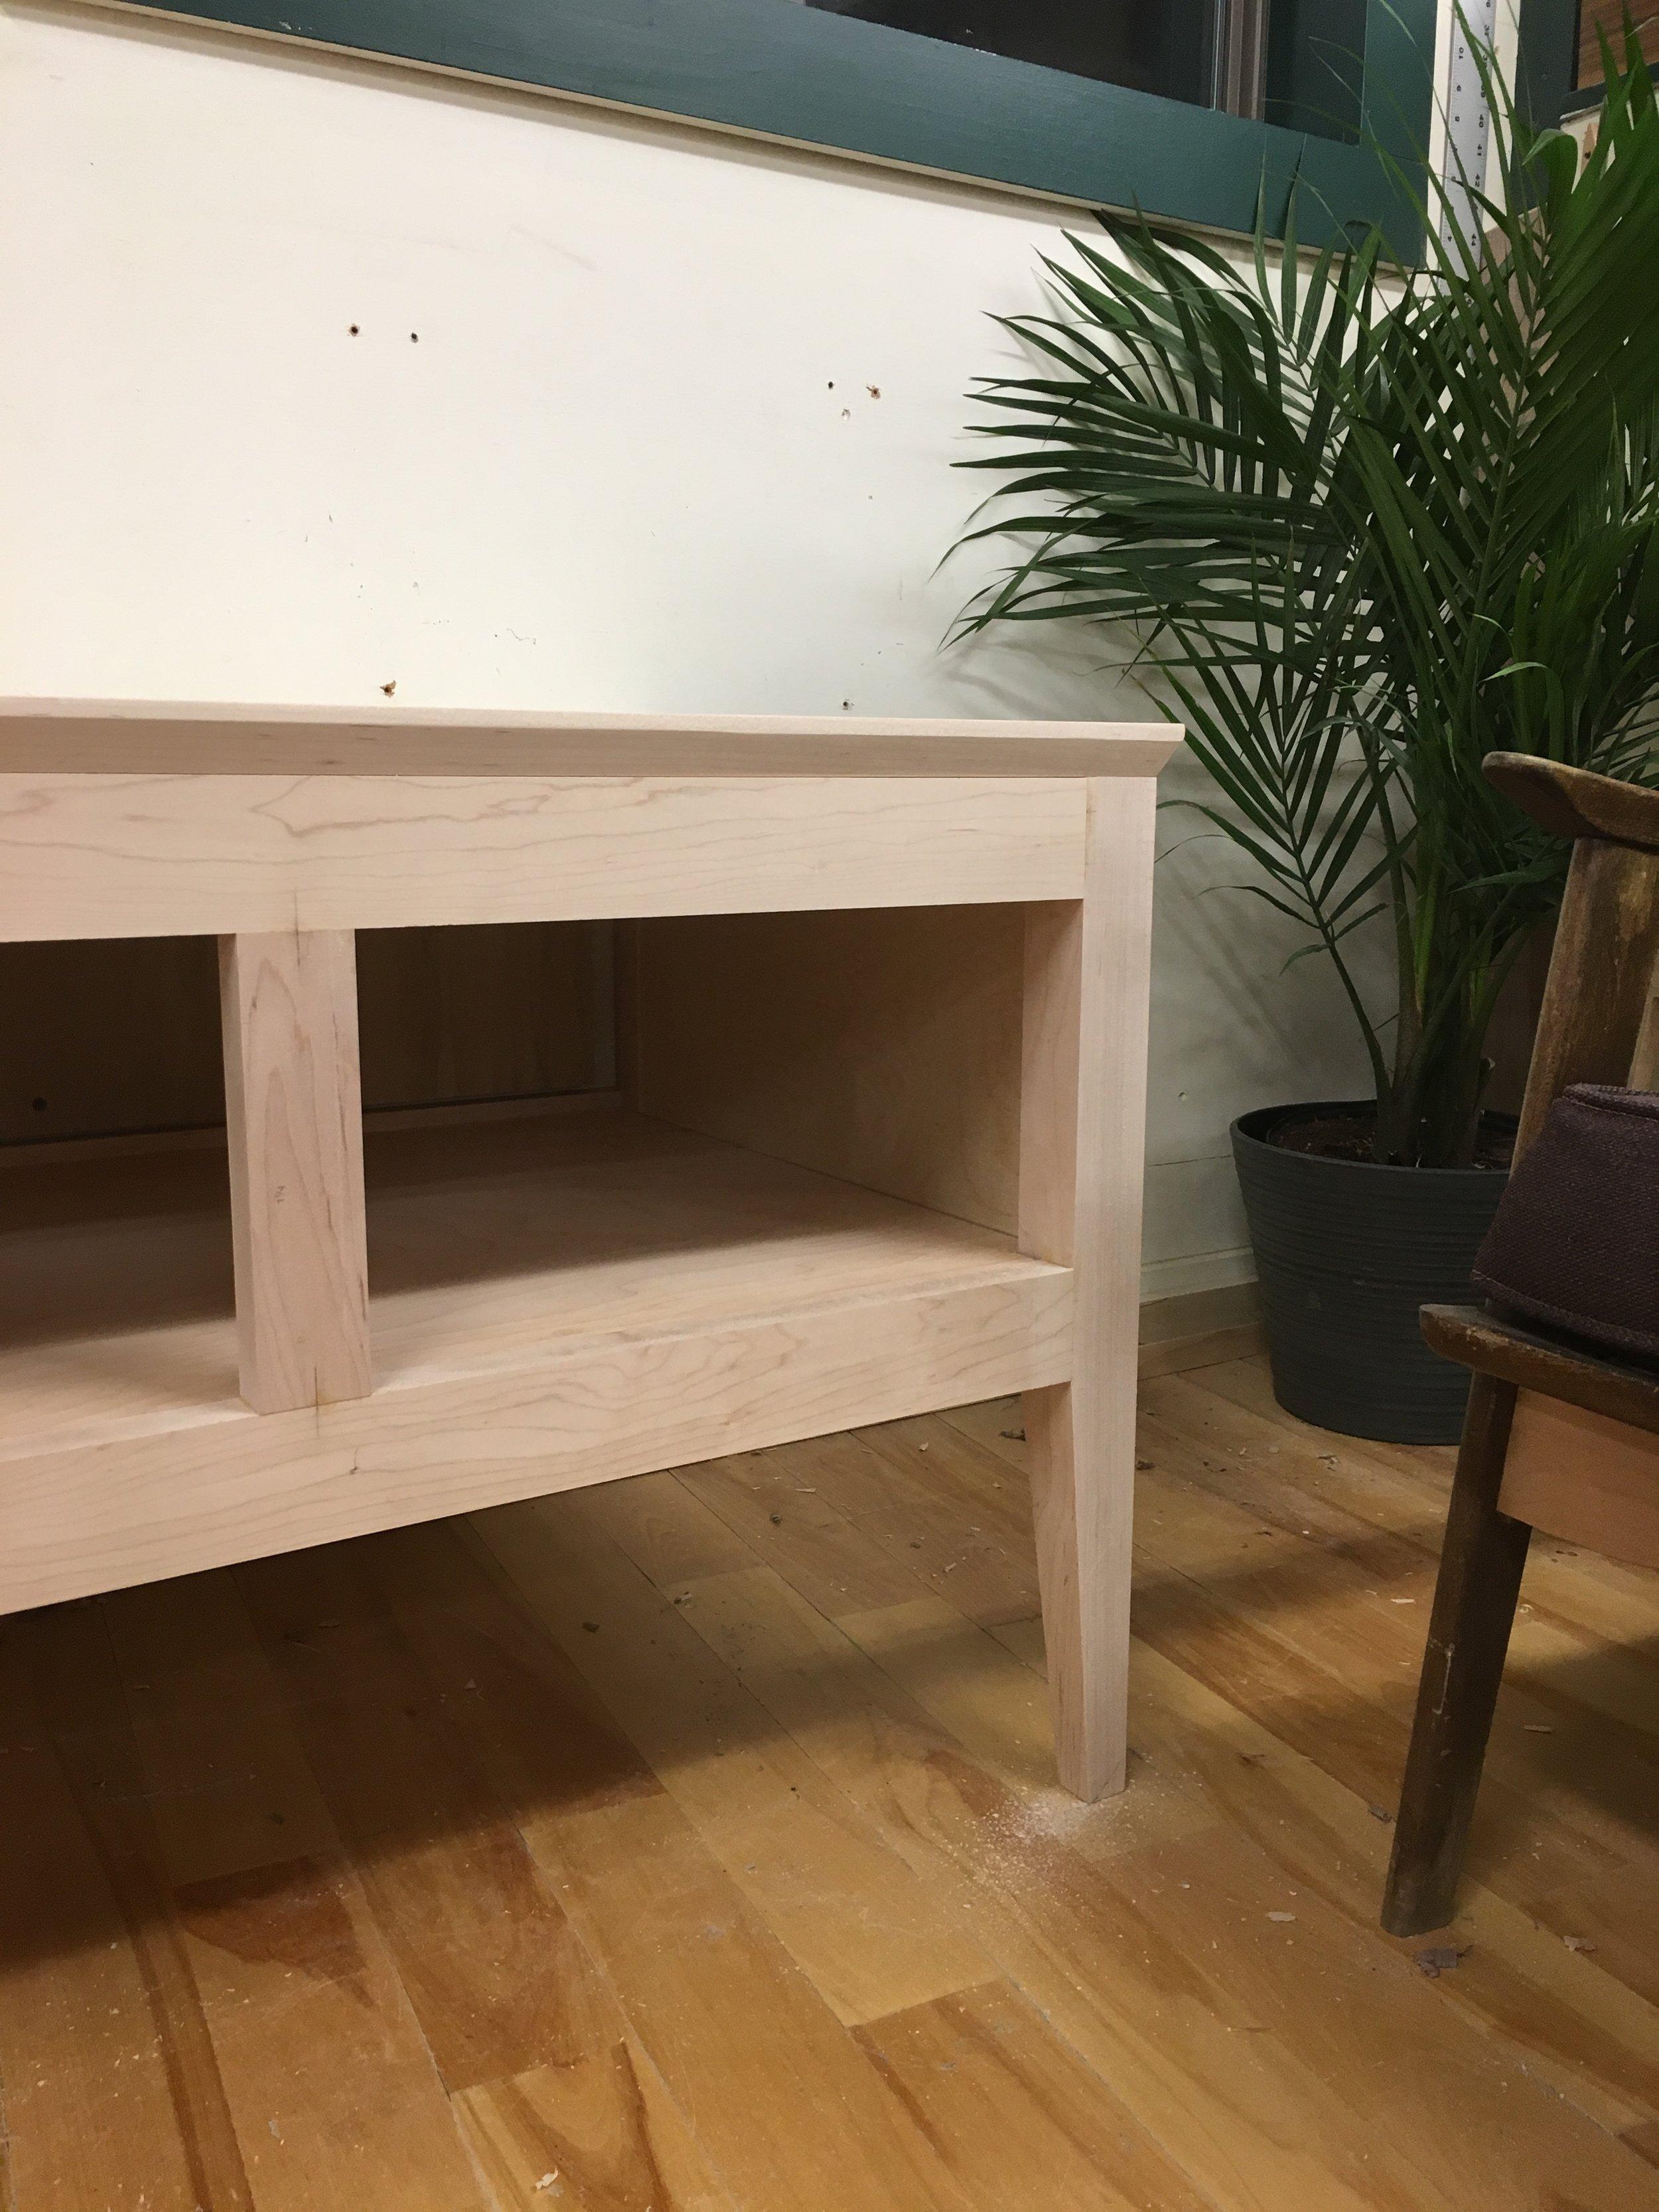 Hone Design Co._Dorchester Bench 4